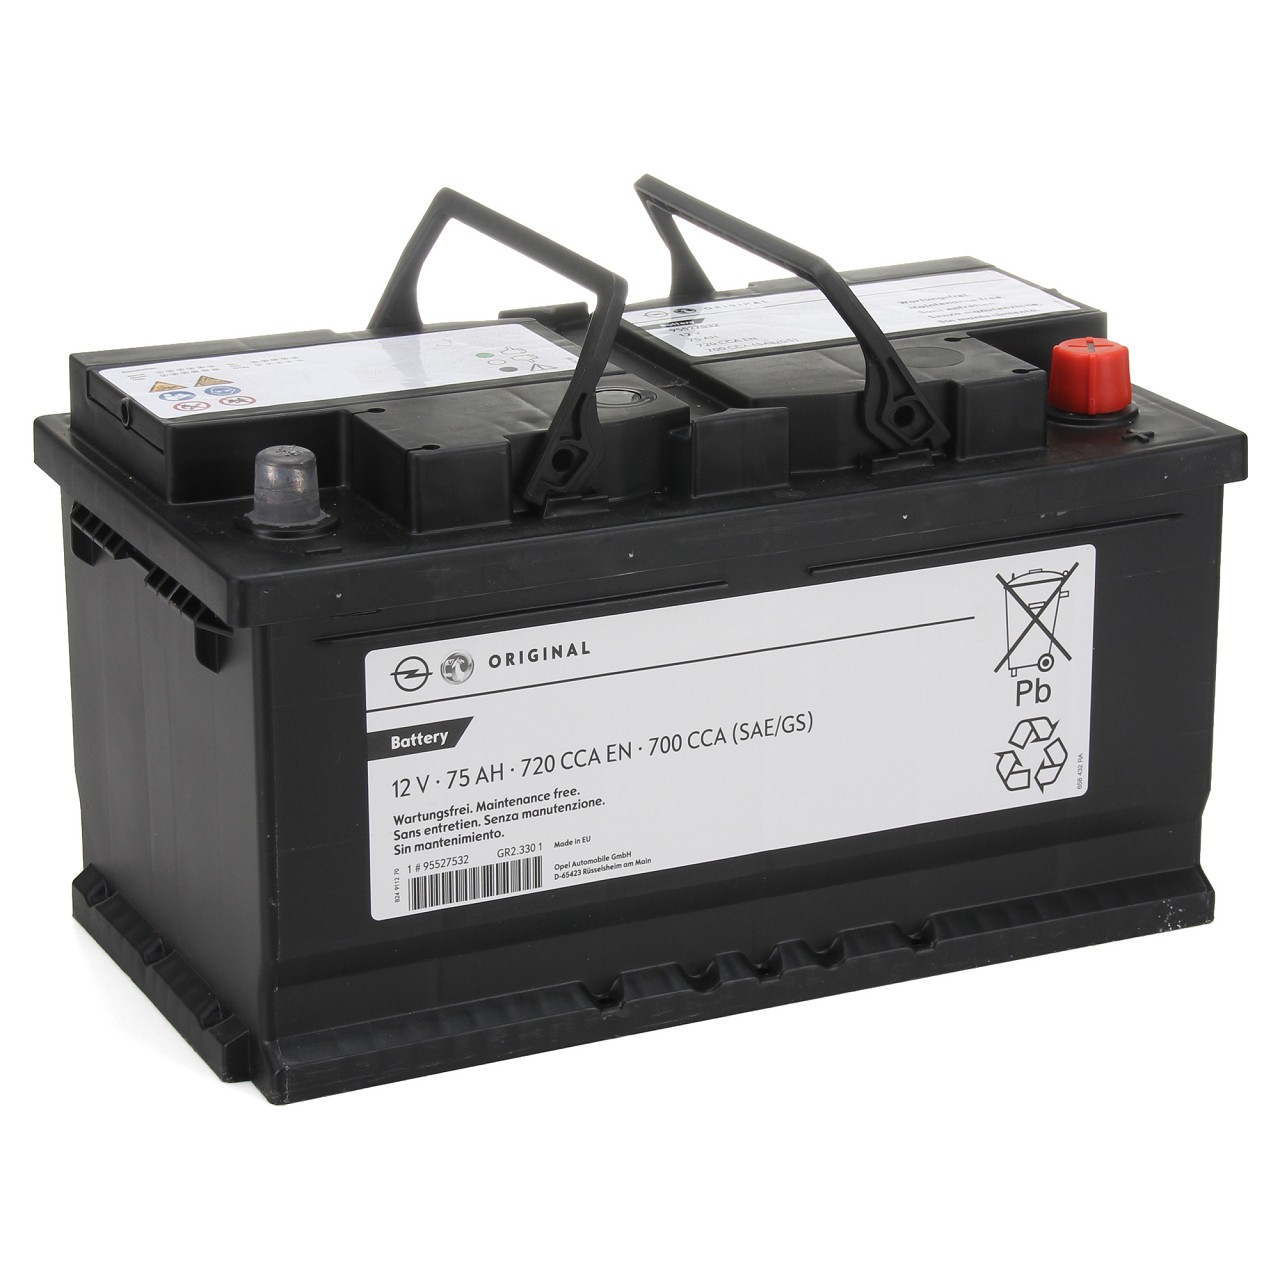 ORIGINAL Opel Autobatterie Batterie Starterbatterie 12V 75Ah 700/720A 995527532